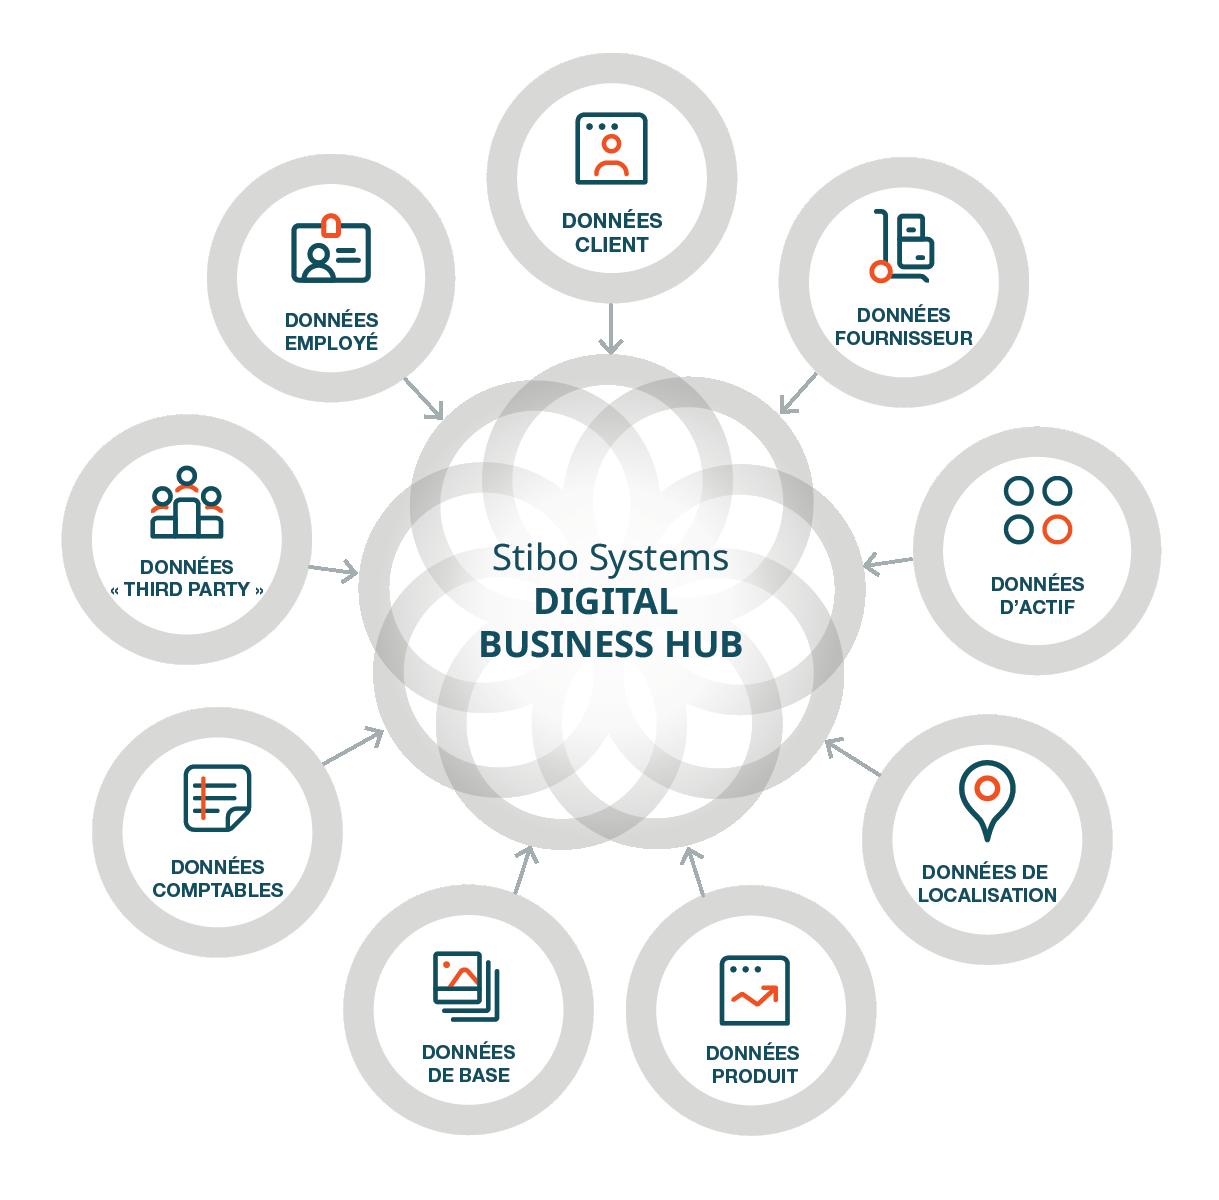 web_digital business hub domains_translations-FR